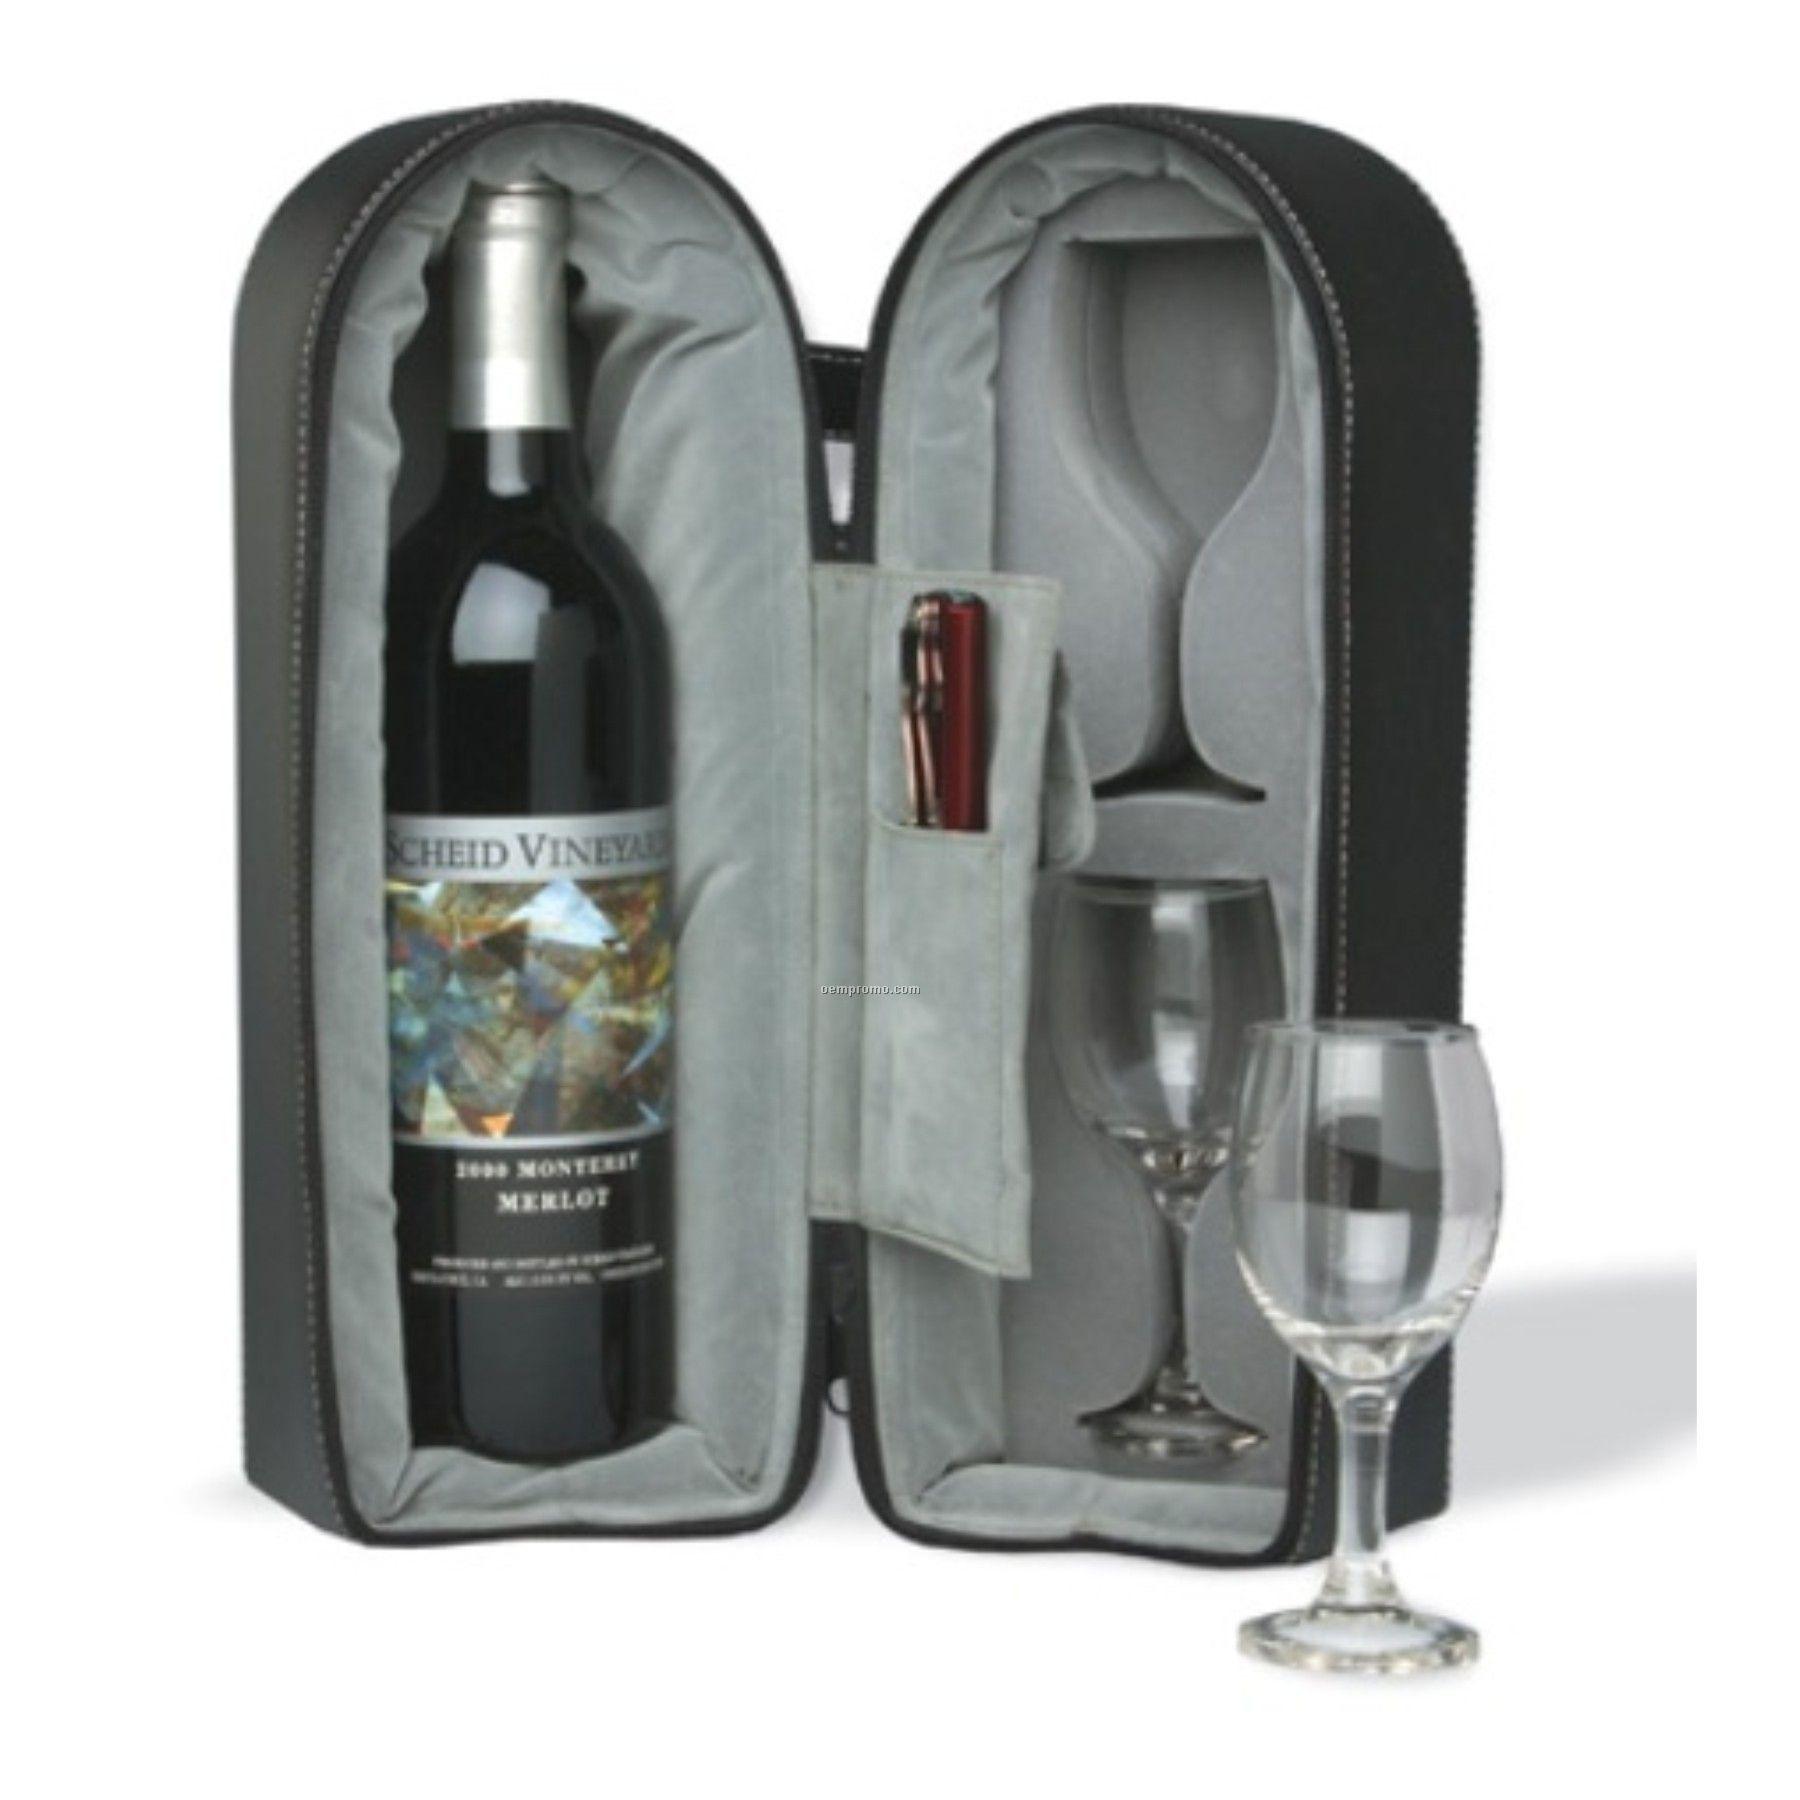 Wine Travel Case With 2 Glasses & Corkscrew (Laser Engraved)